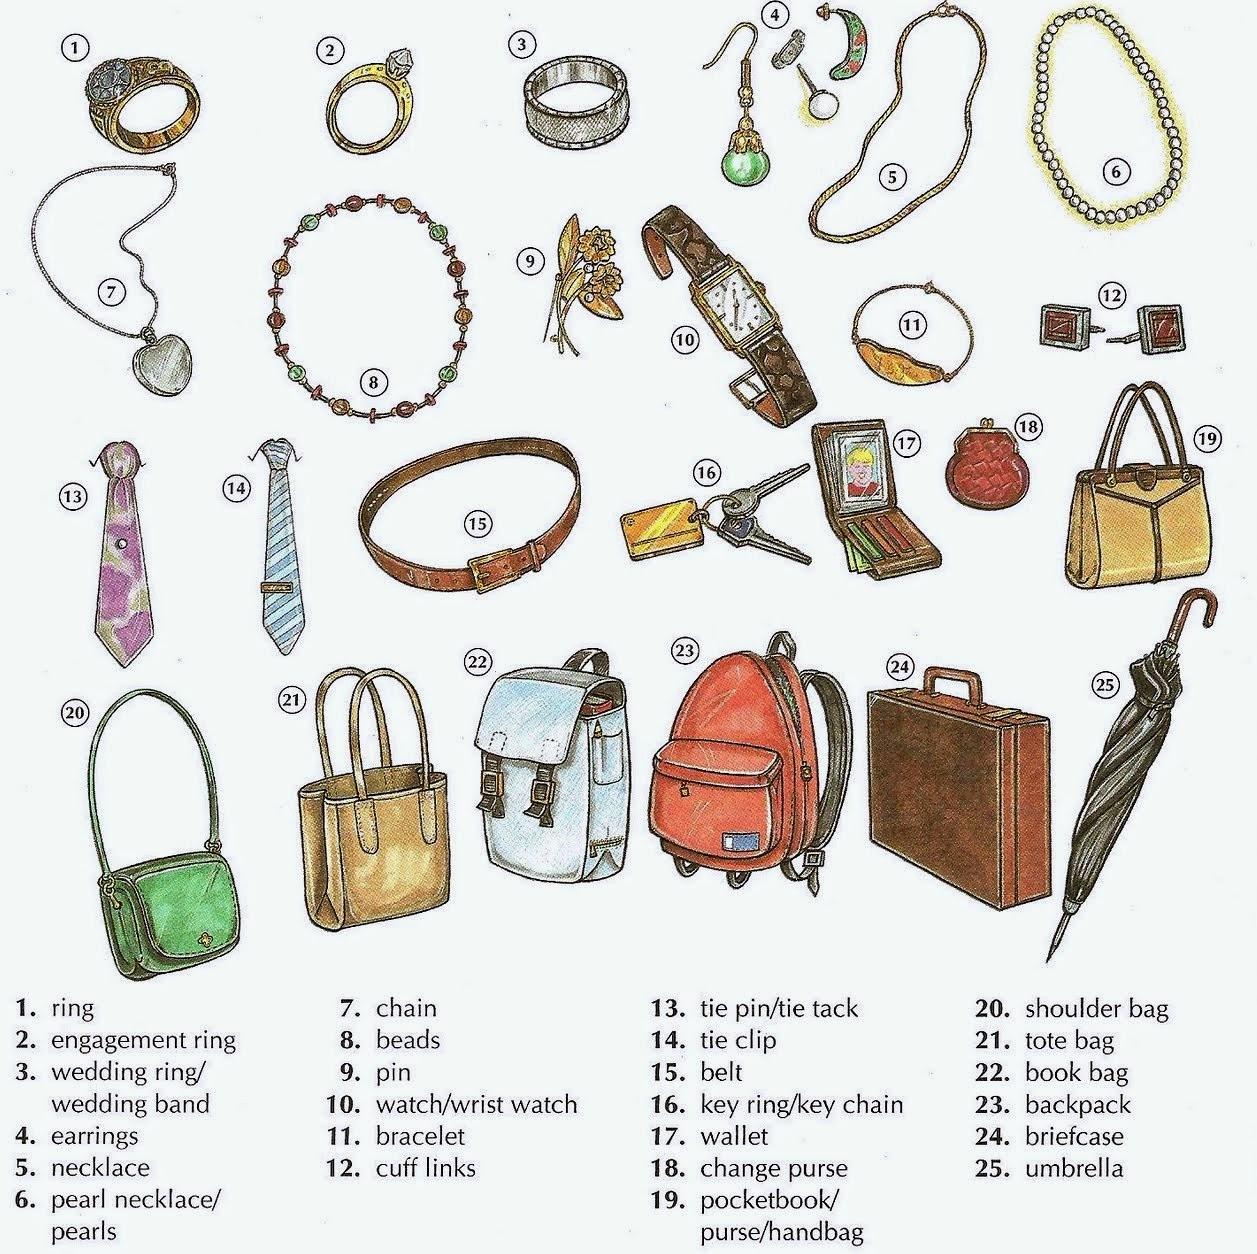 Lestoenglish Accessories Vocabulary